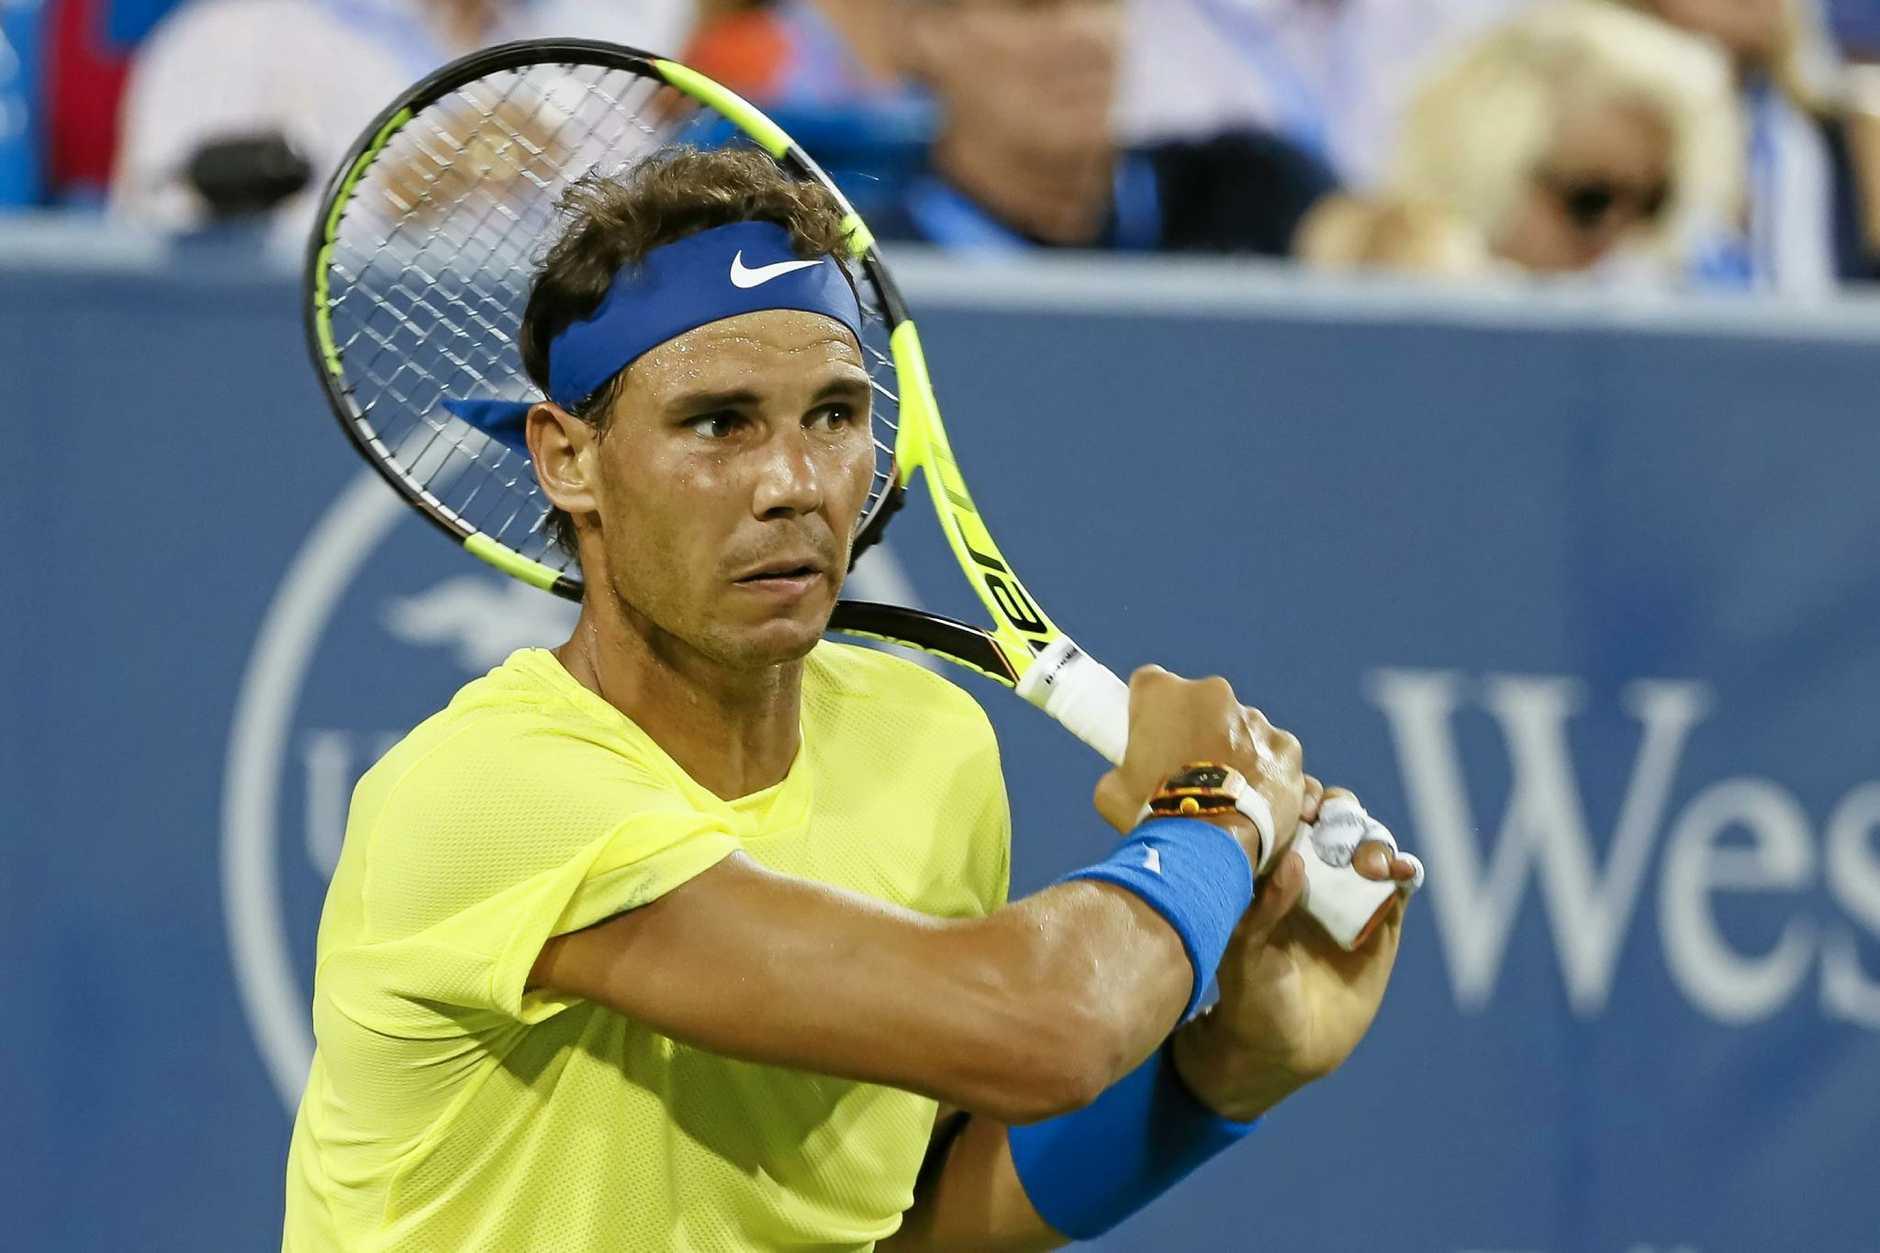 Rafael Nadal of Spain returns to Nick Kyrgios of Australia in Cincinnati.